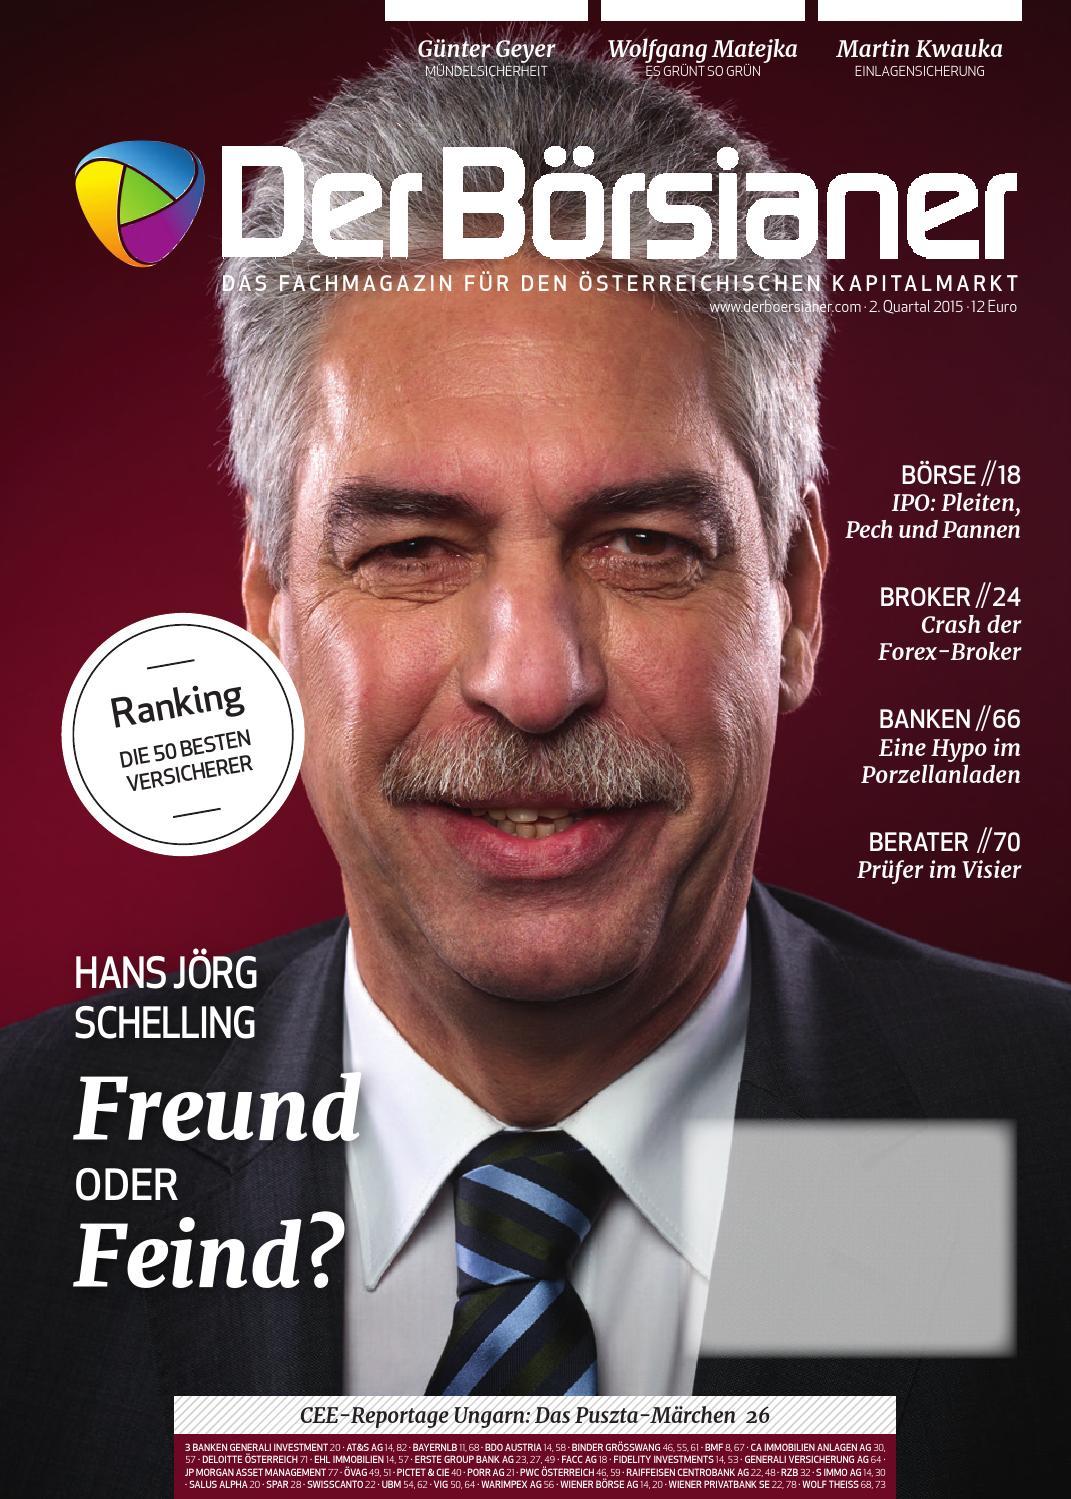 Bmf forex broker